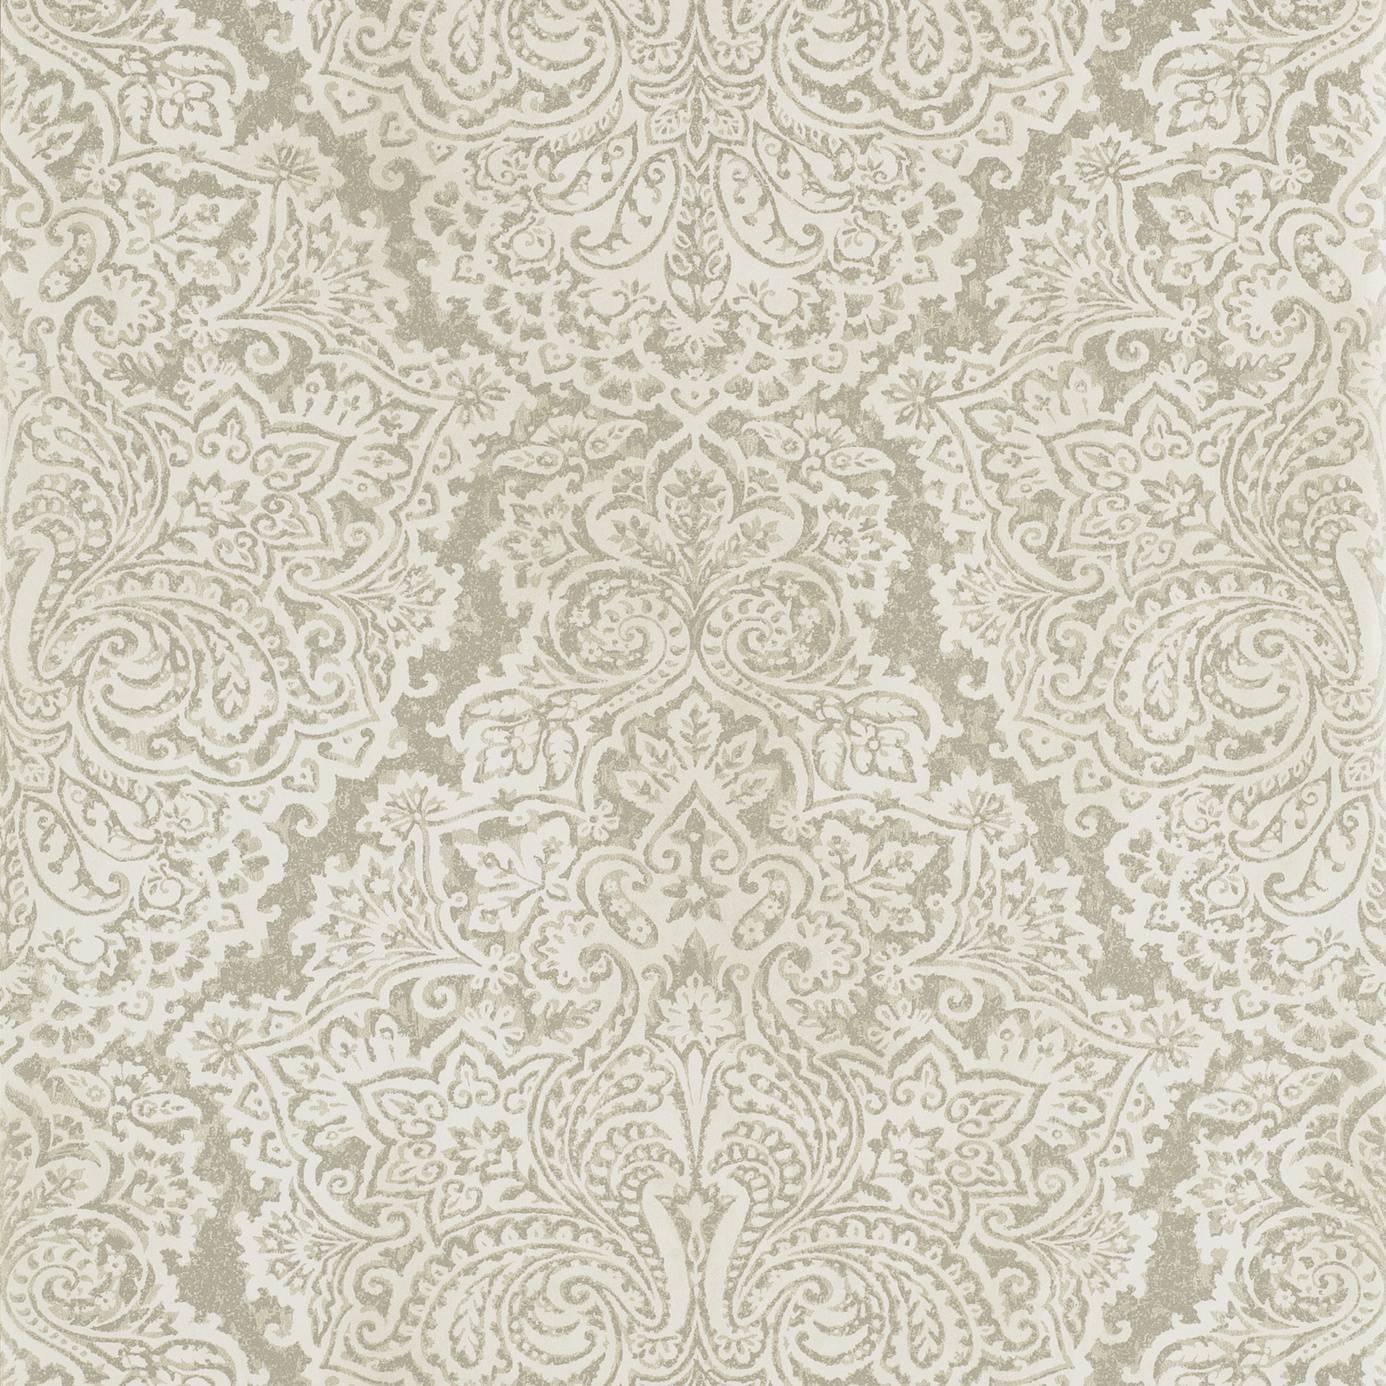 Home Wallpapers Harlequin Leonida Wallpapers Aurelia Wallpaper   White 1386x1386